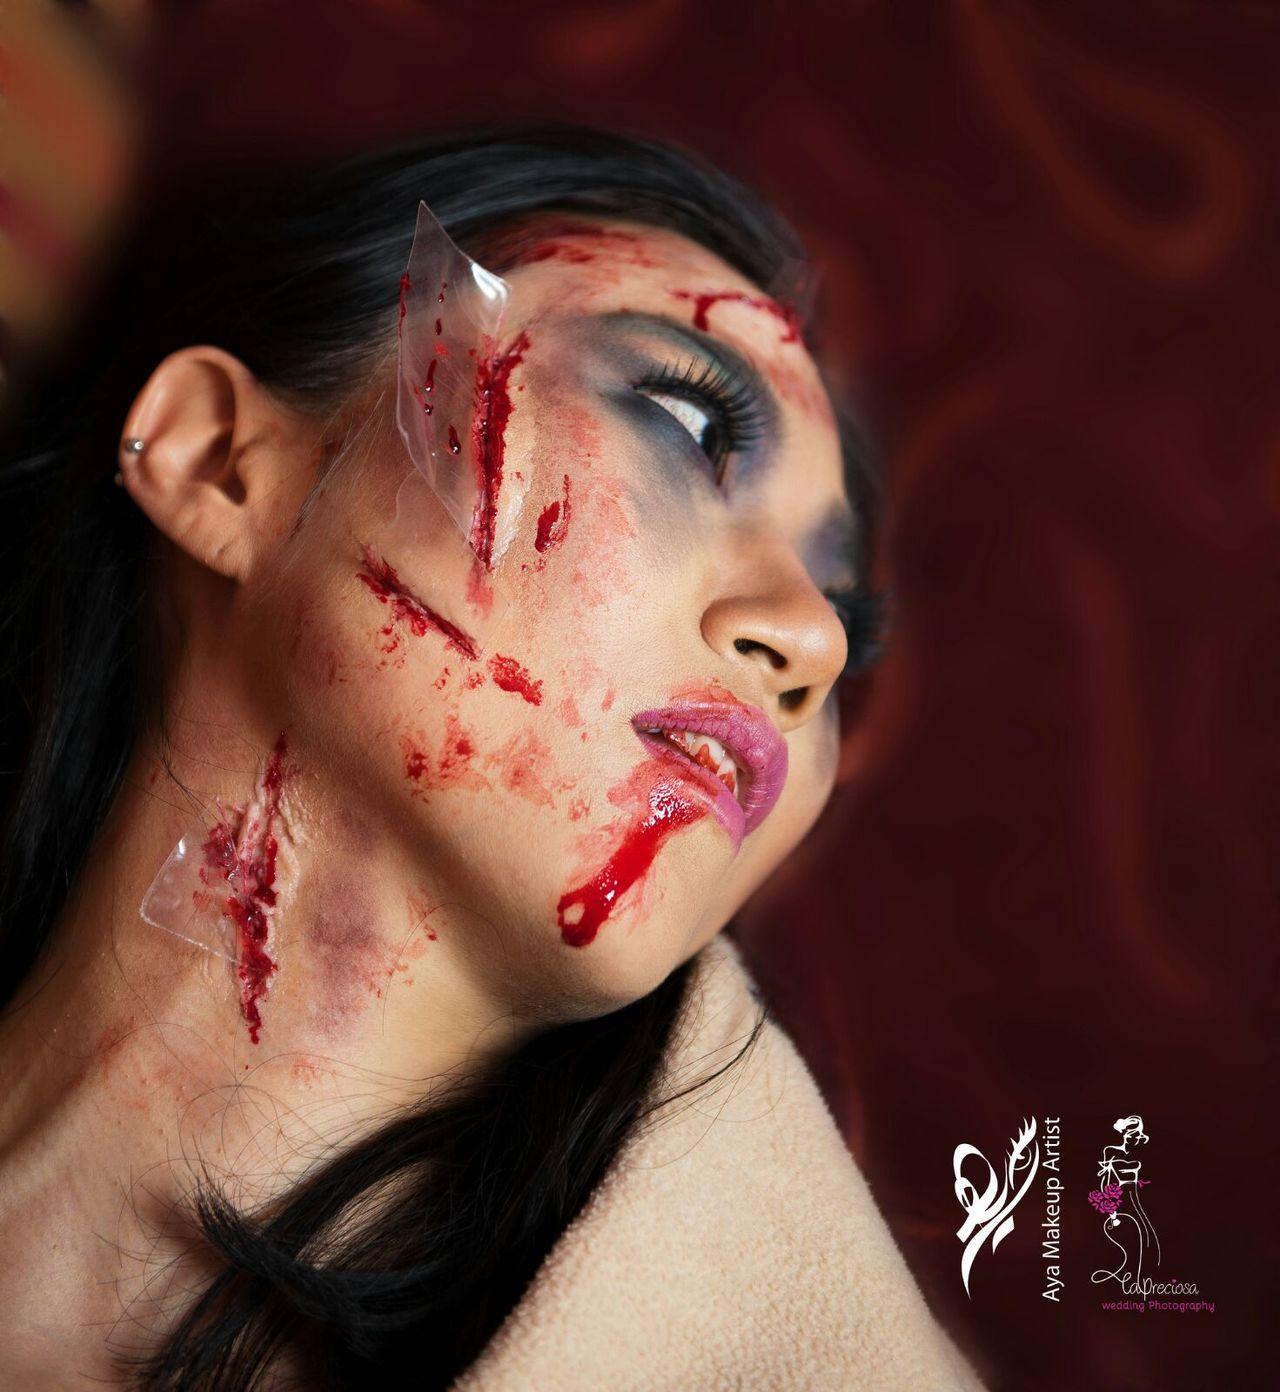 MakeupJunkie Blood Physical Injury Pain Makeupideas Makeup Art Cultures Makeuptransformation Makeupartist Portrait Blush - Make-up Human Body Part Makeup By Me Lifestyles Make-up